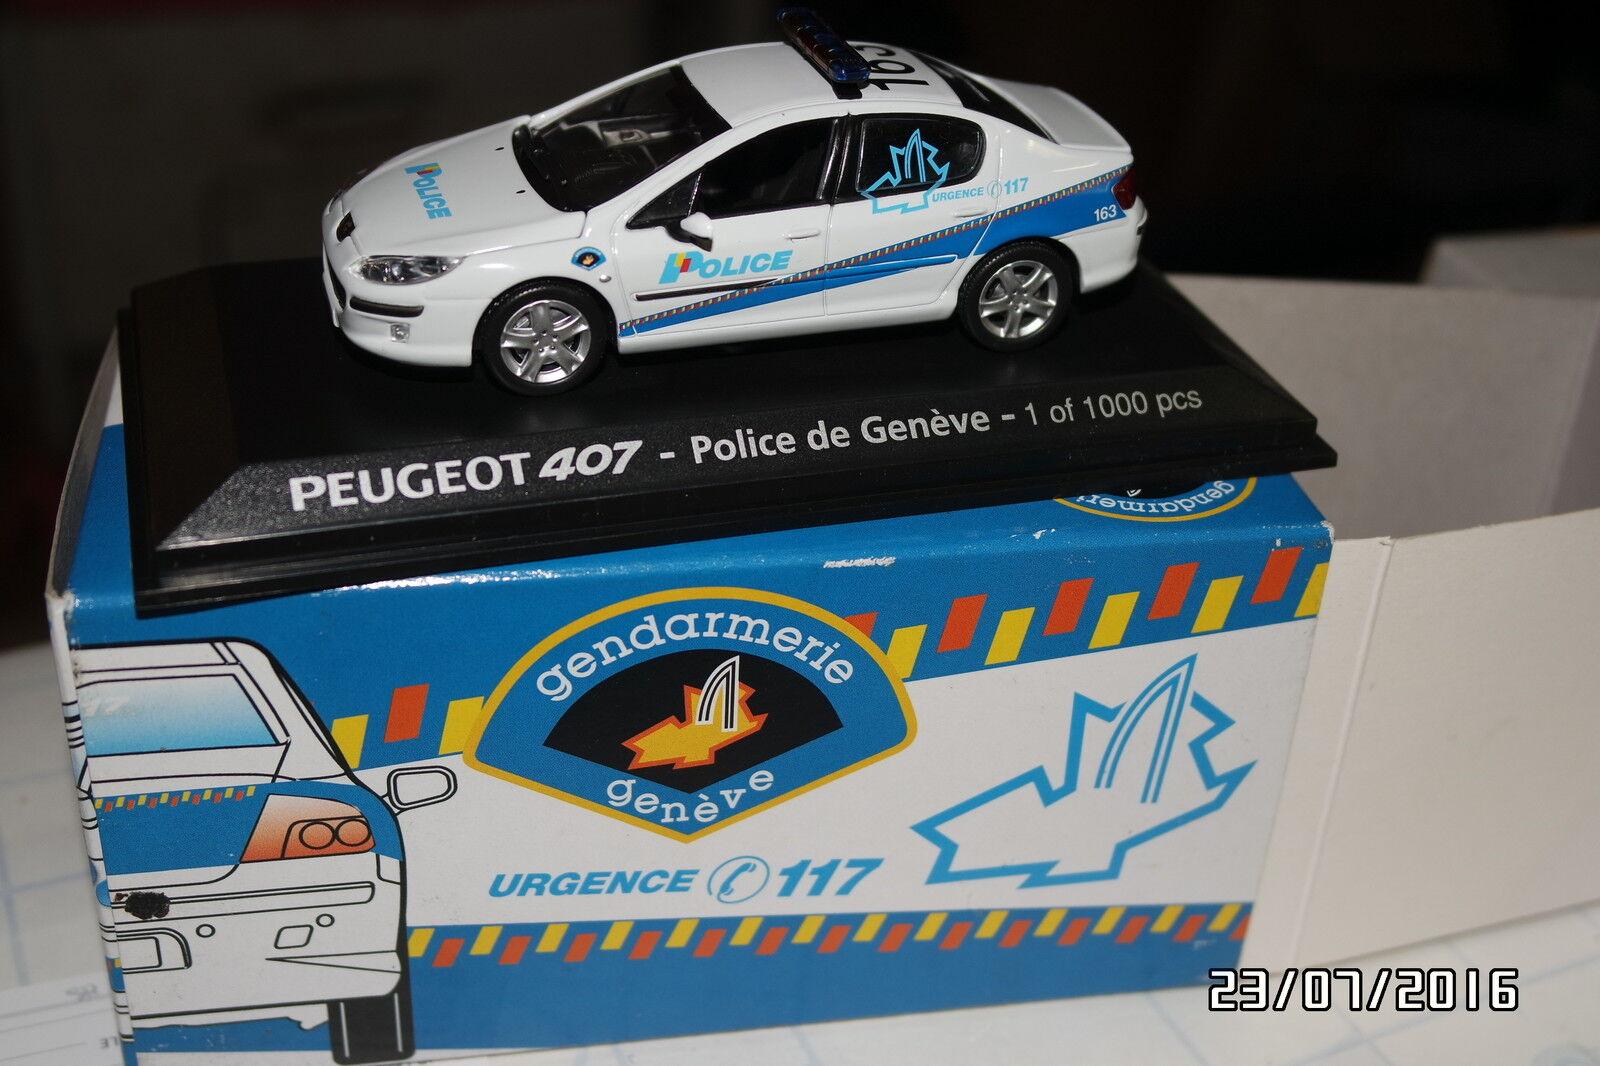 Peugeot 407 police geneve norev 474741 ed limitee 1000 p. new box